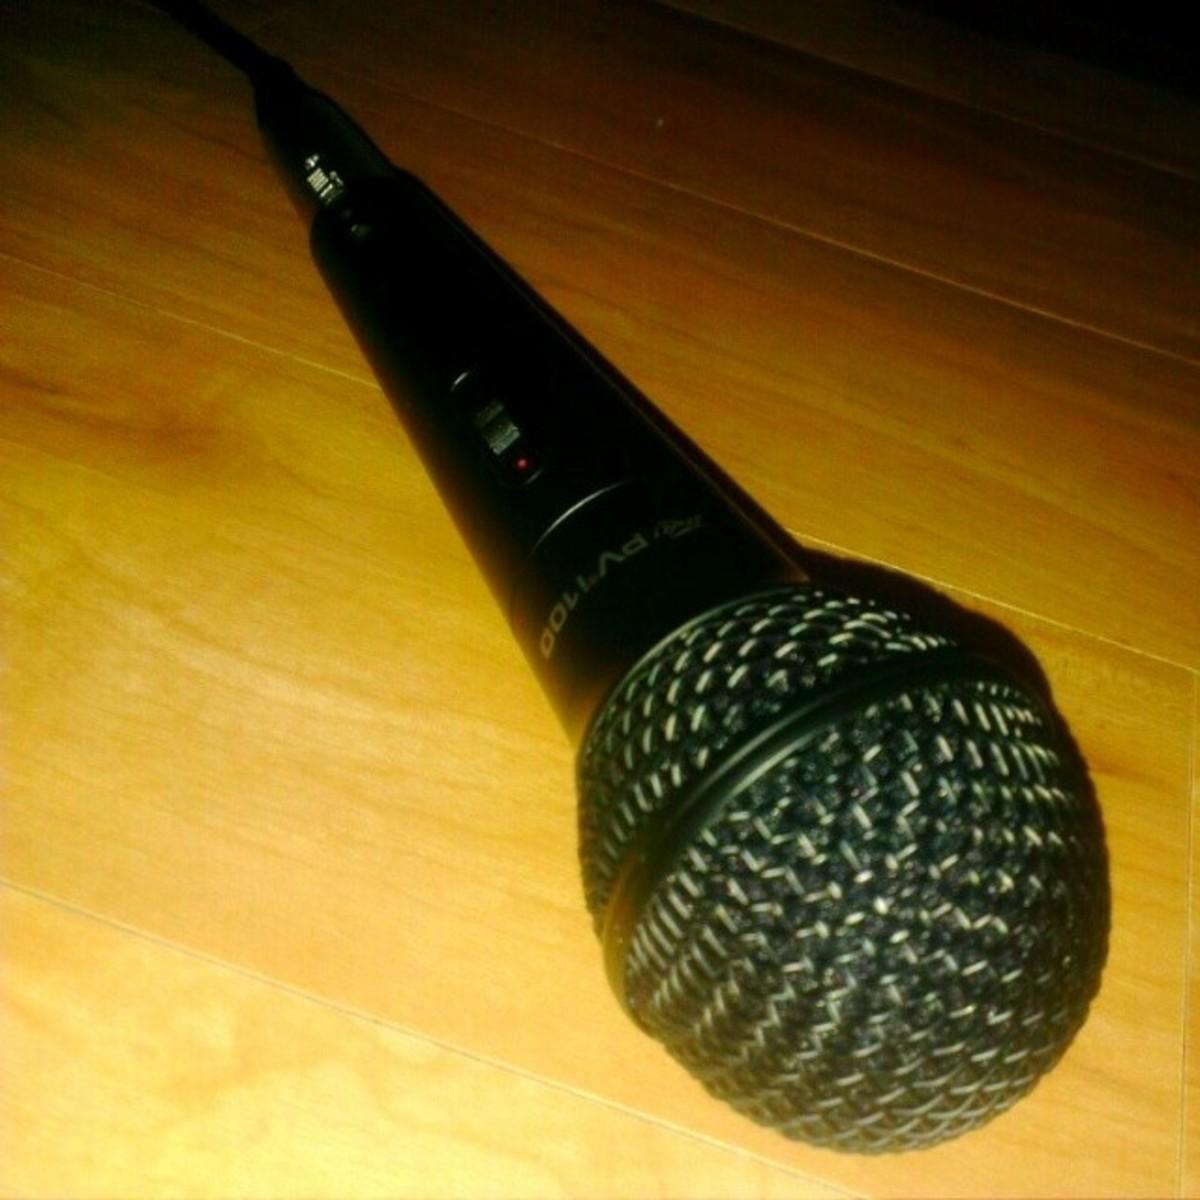 peavey-pvi-100-dynamic-microphone-review